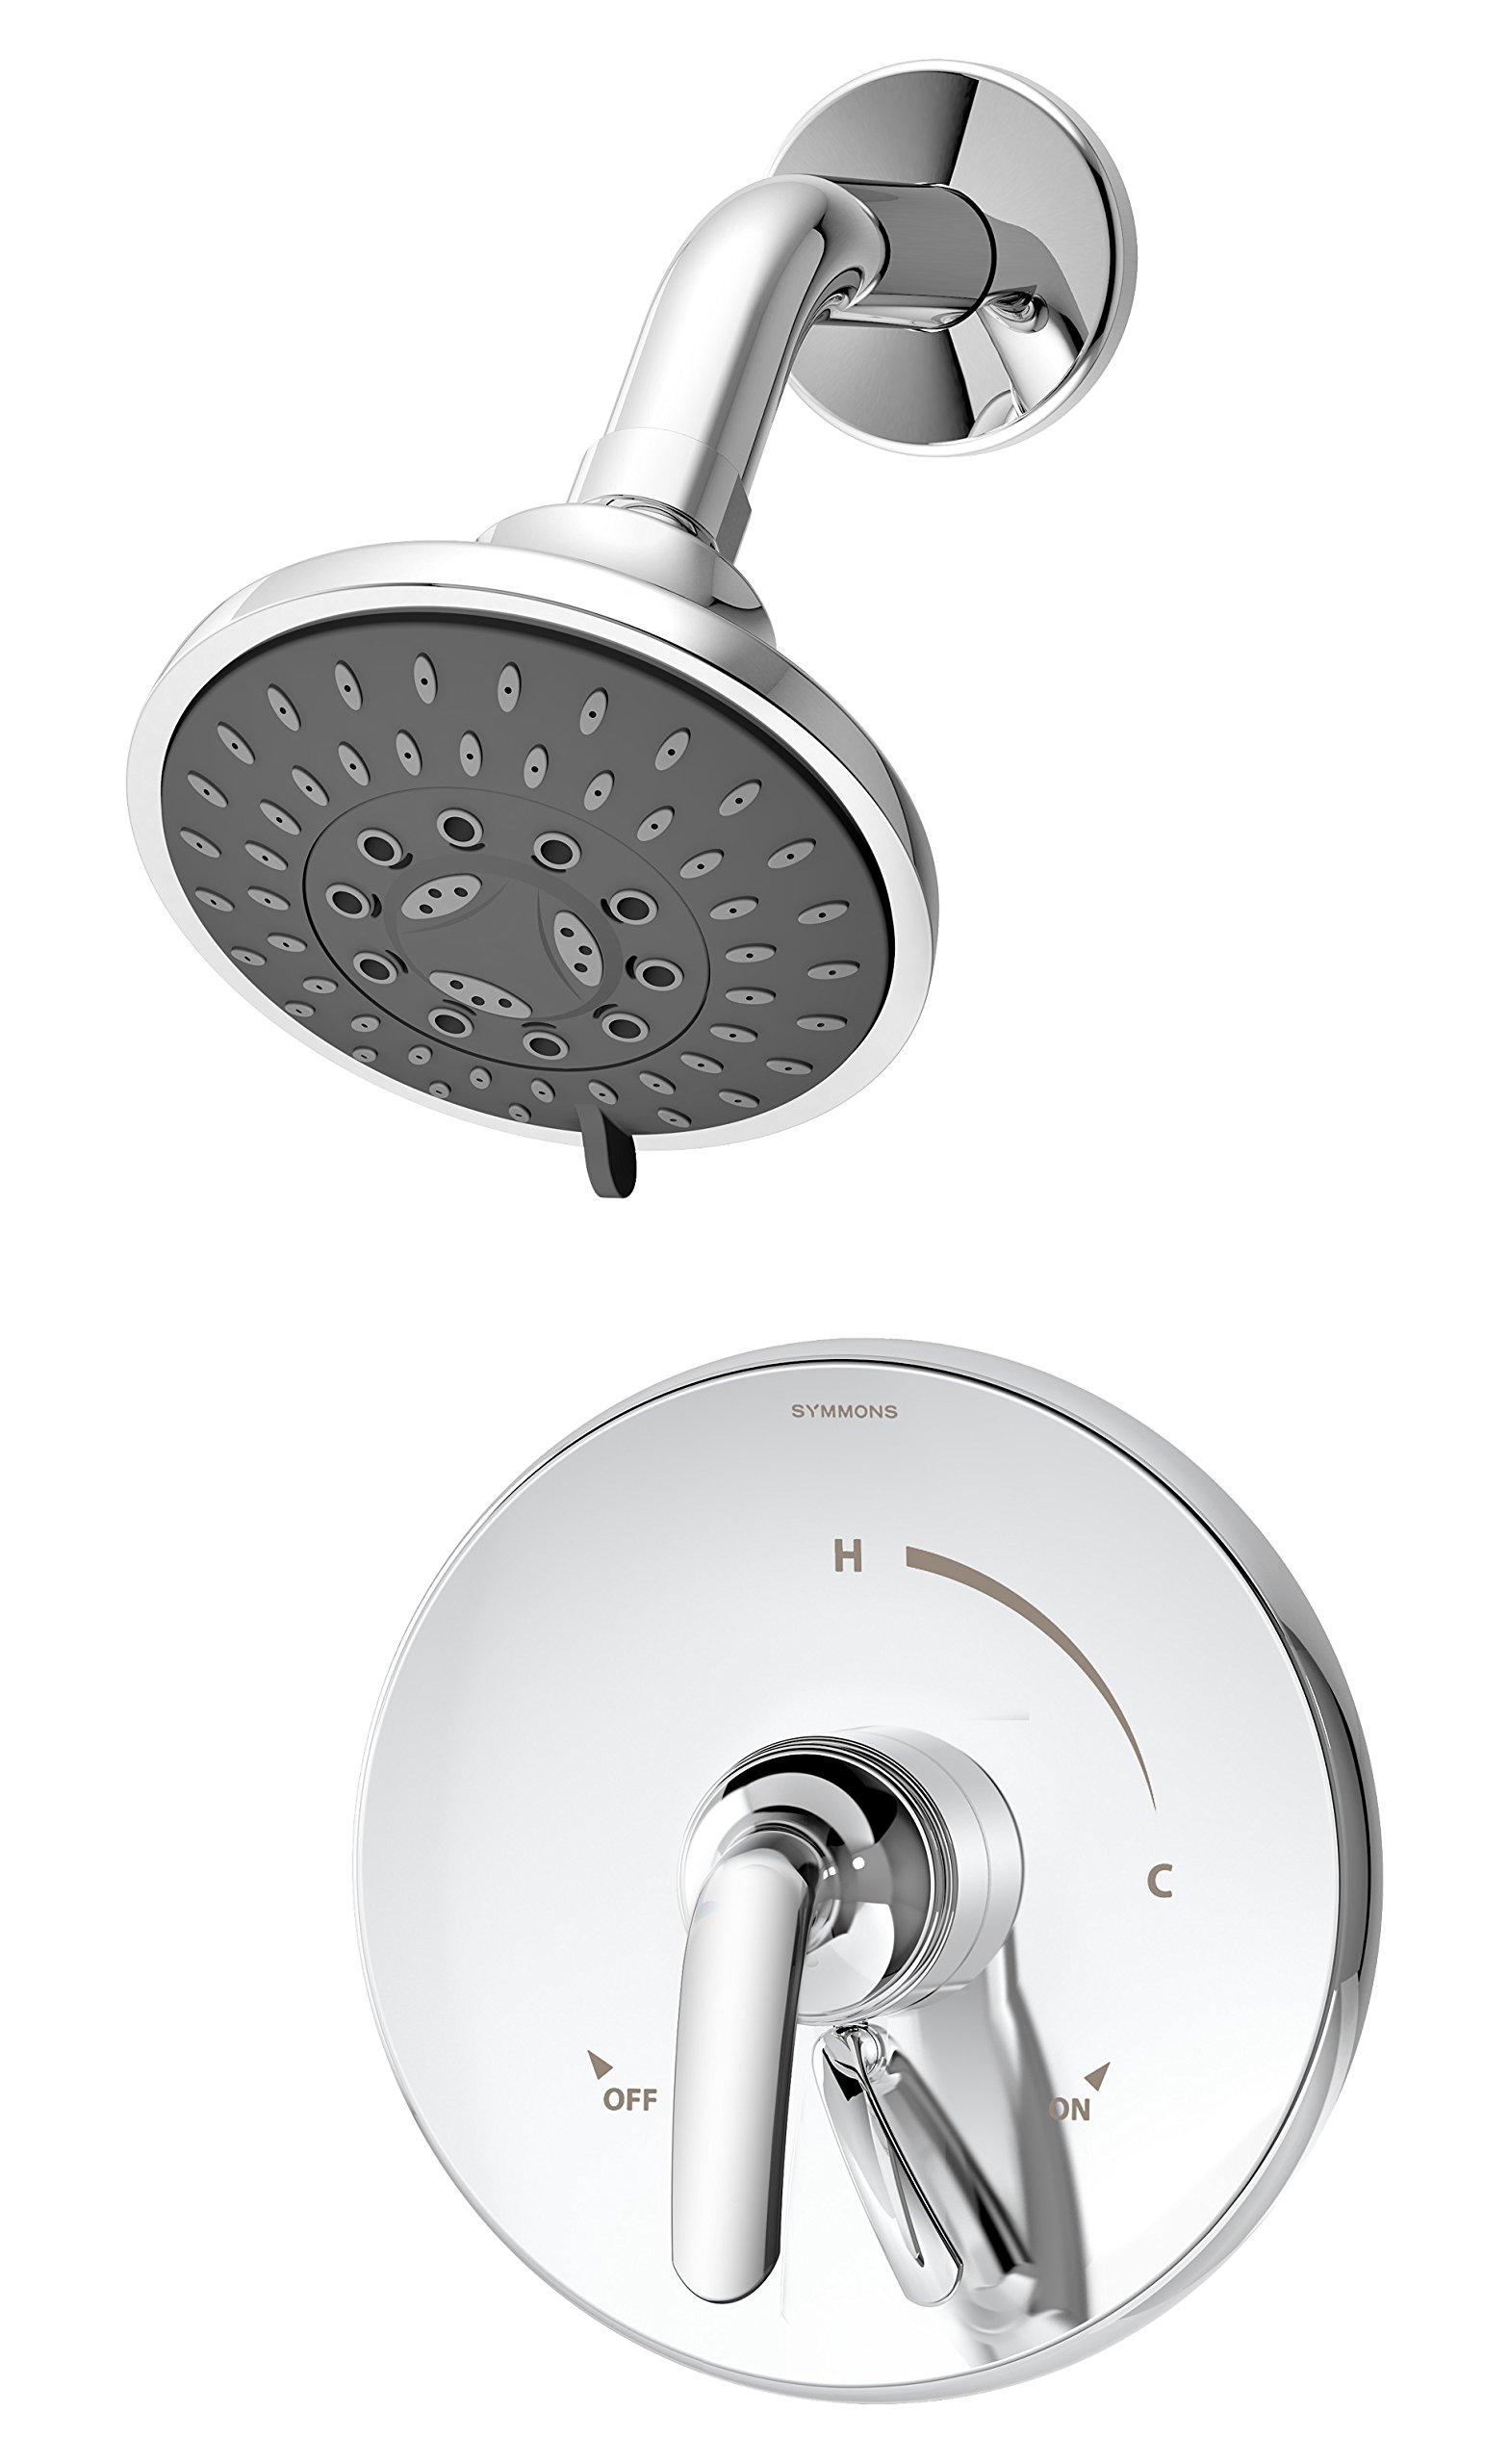 Symmons S-5501 Elm 1- Handle Shower Faucet System, Chrome